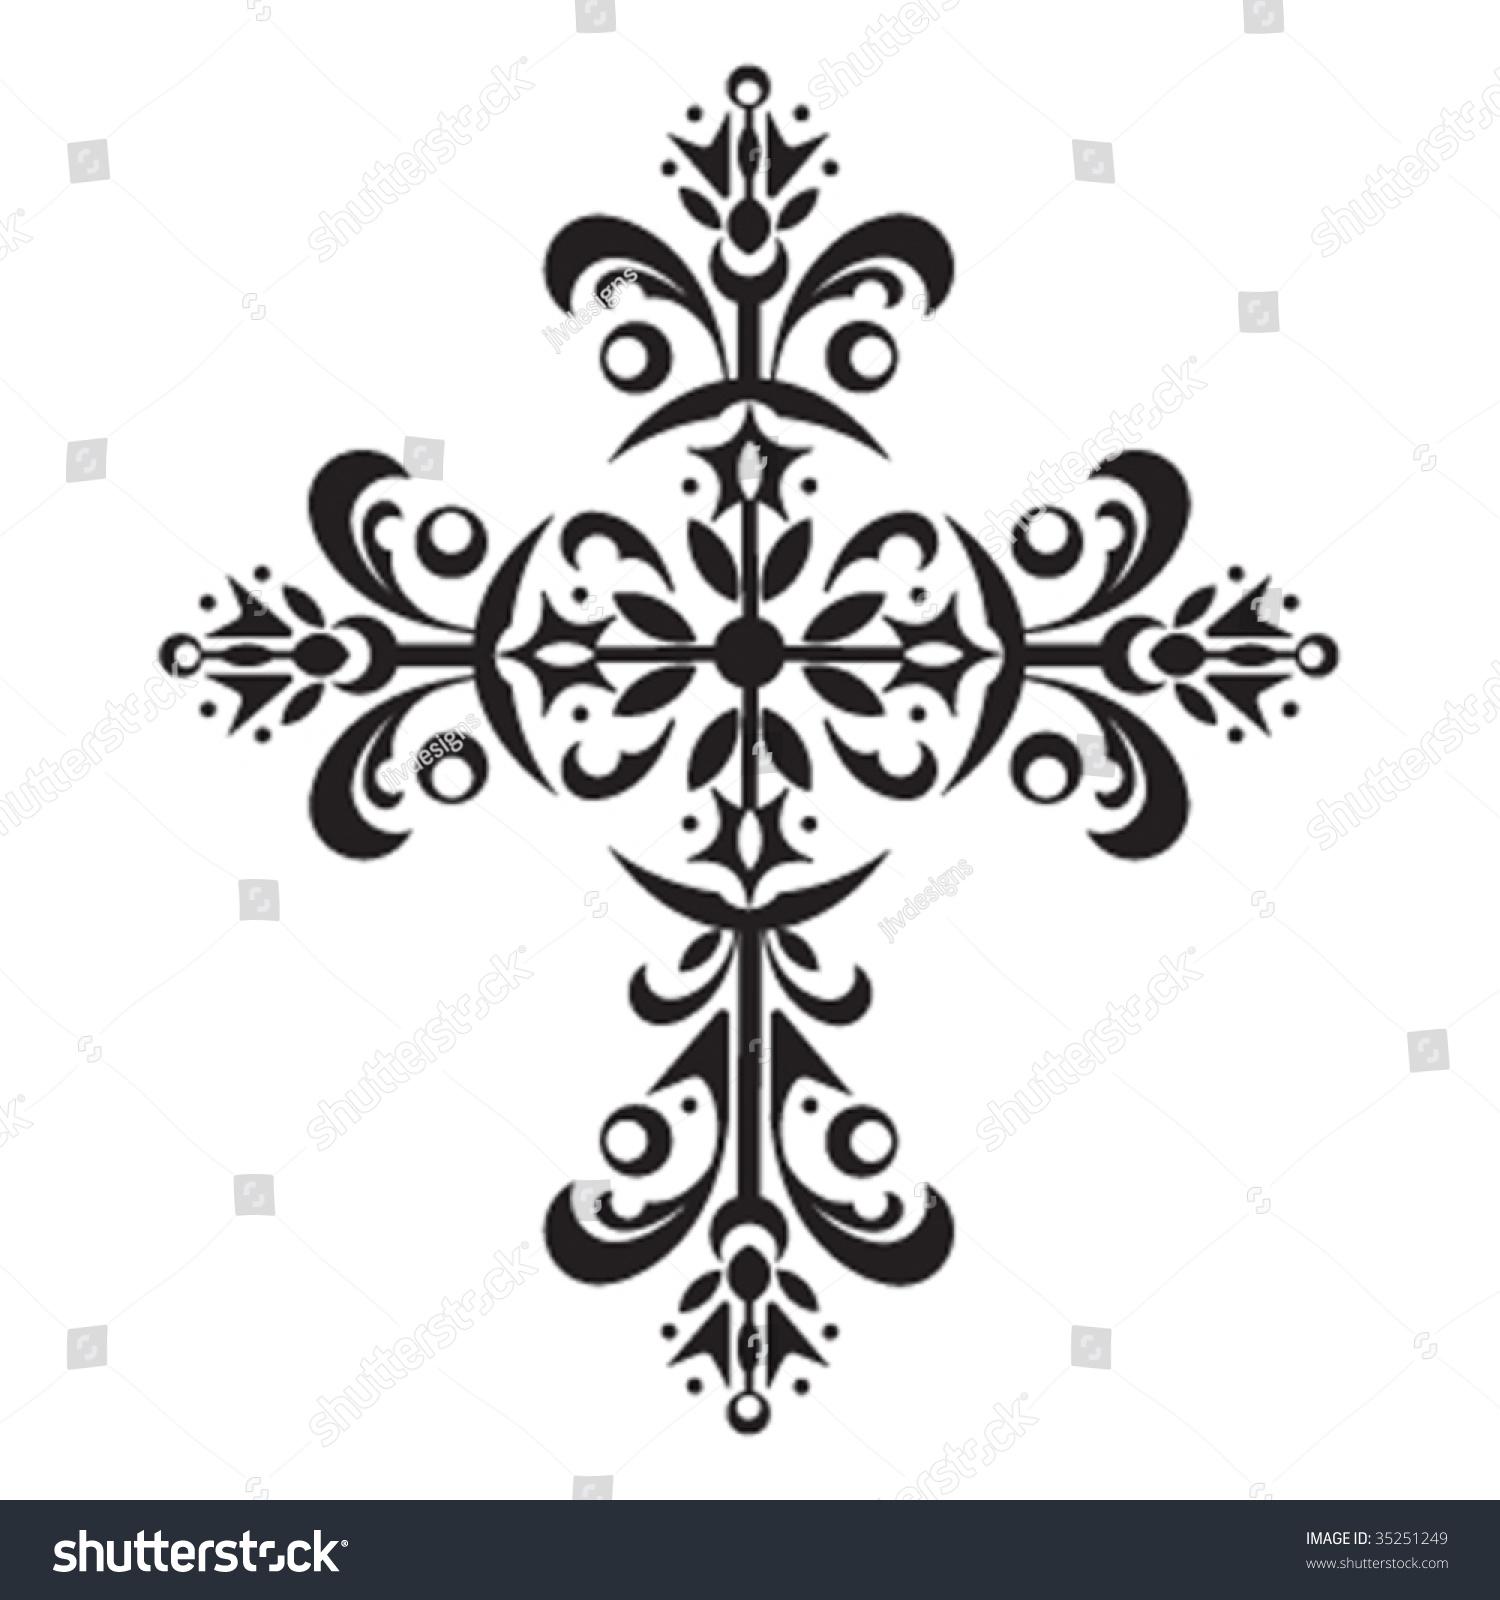 Decorative Cross Stock Vector 35251249 : Shutterstock